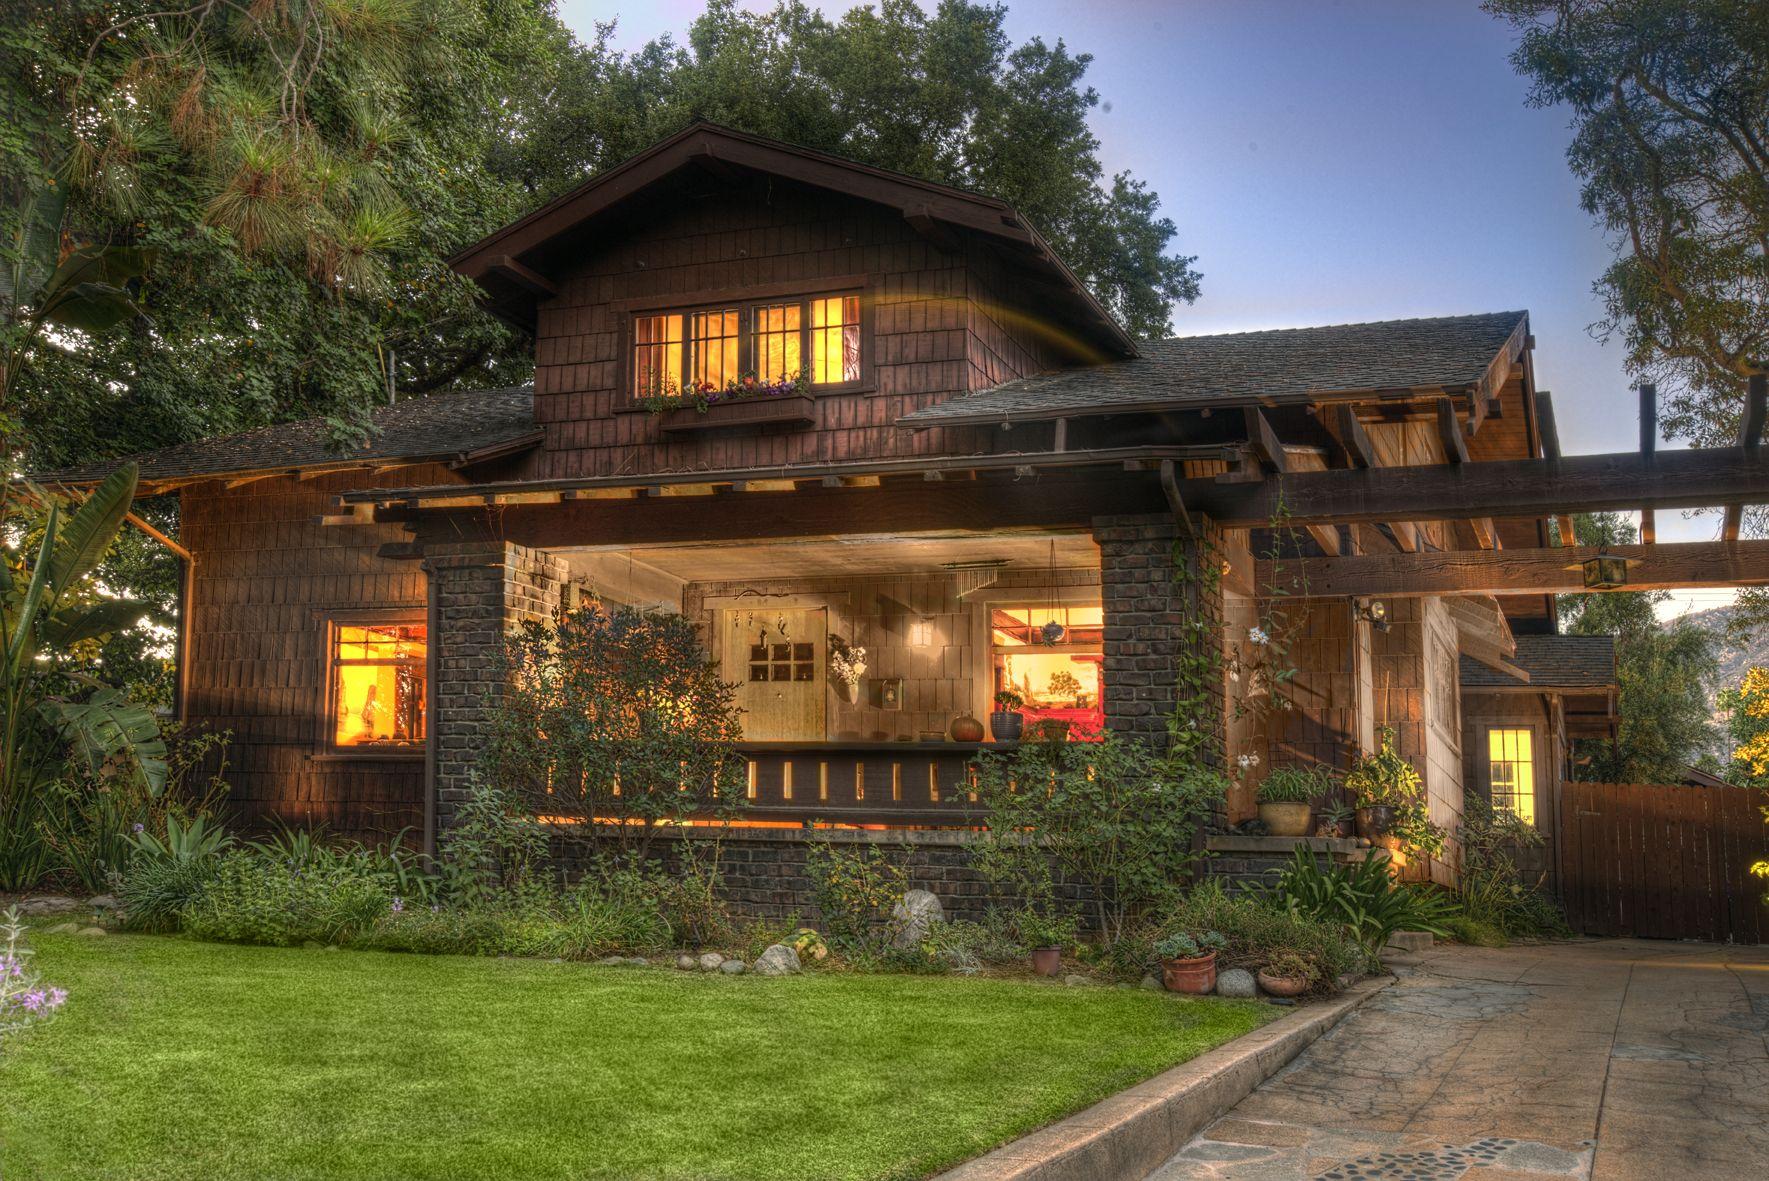 Craftsman Weekend: The Howell House, Harold Doolittle | Pasadena Heritage #craftsmanstylehomes